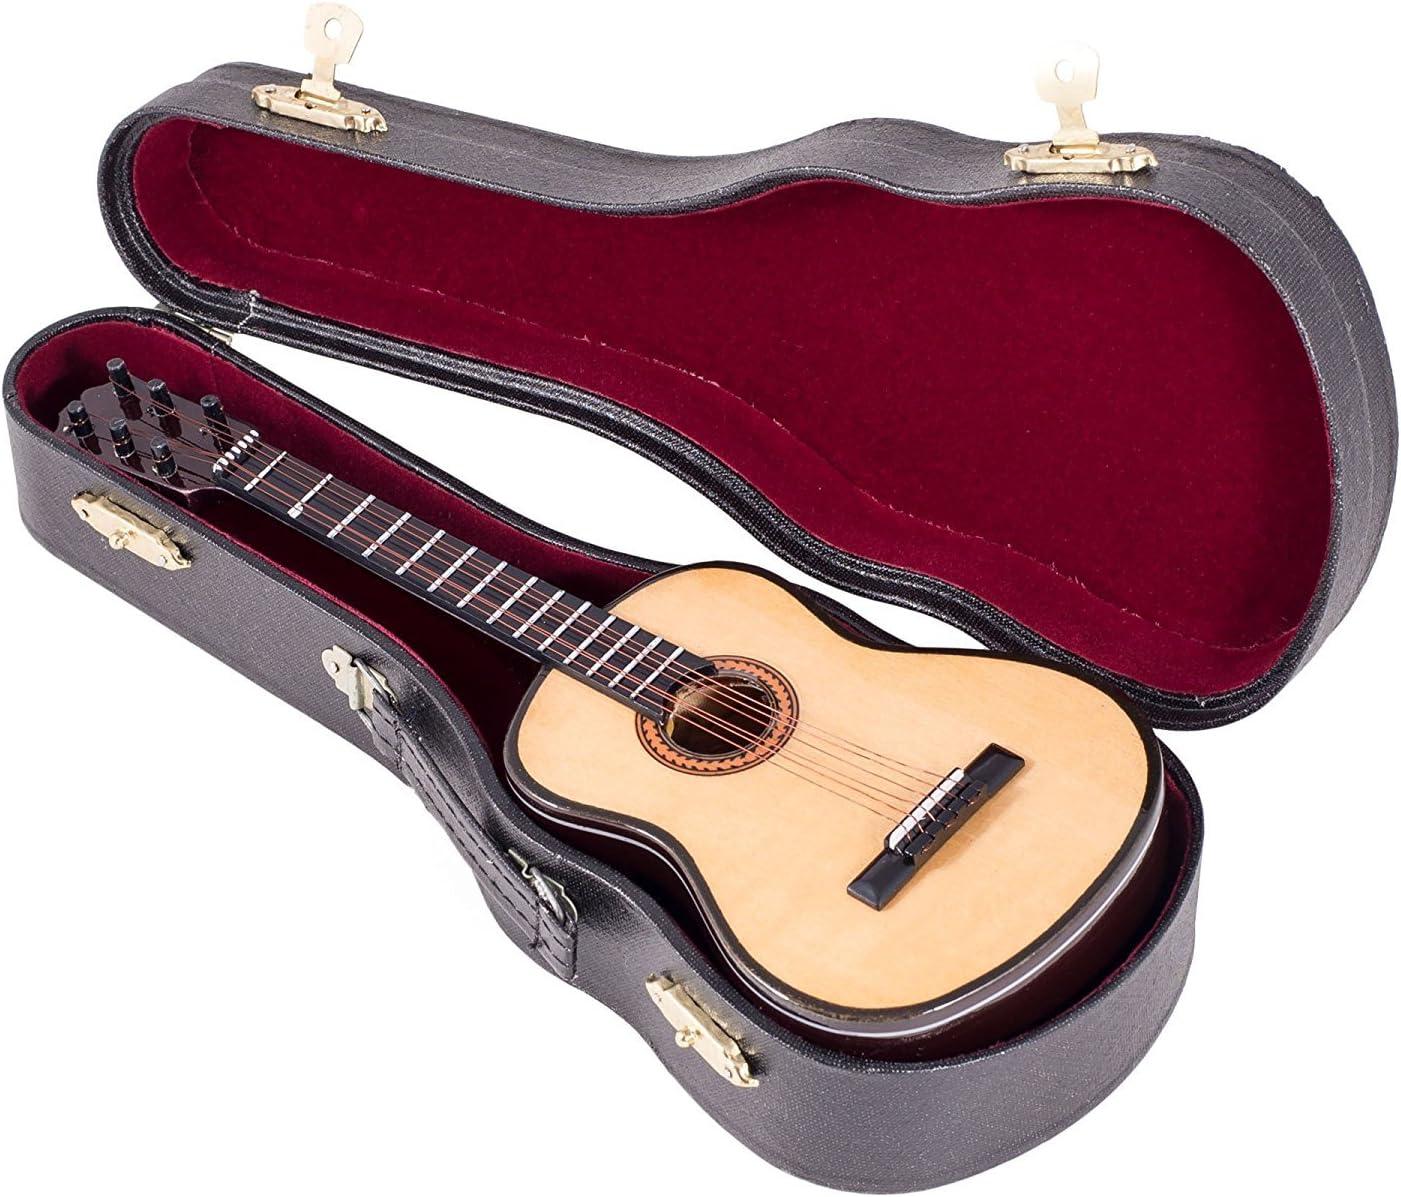 7.1 Inch 3.0 Musical Box Mini Guitar Shaped Rotating Music Box for Wedding 3.0